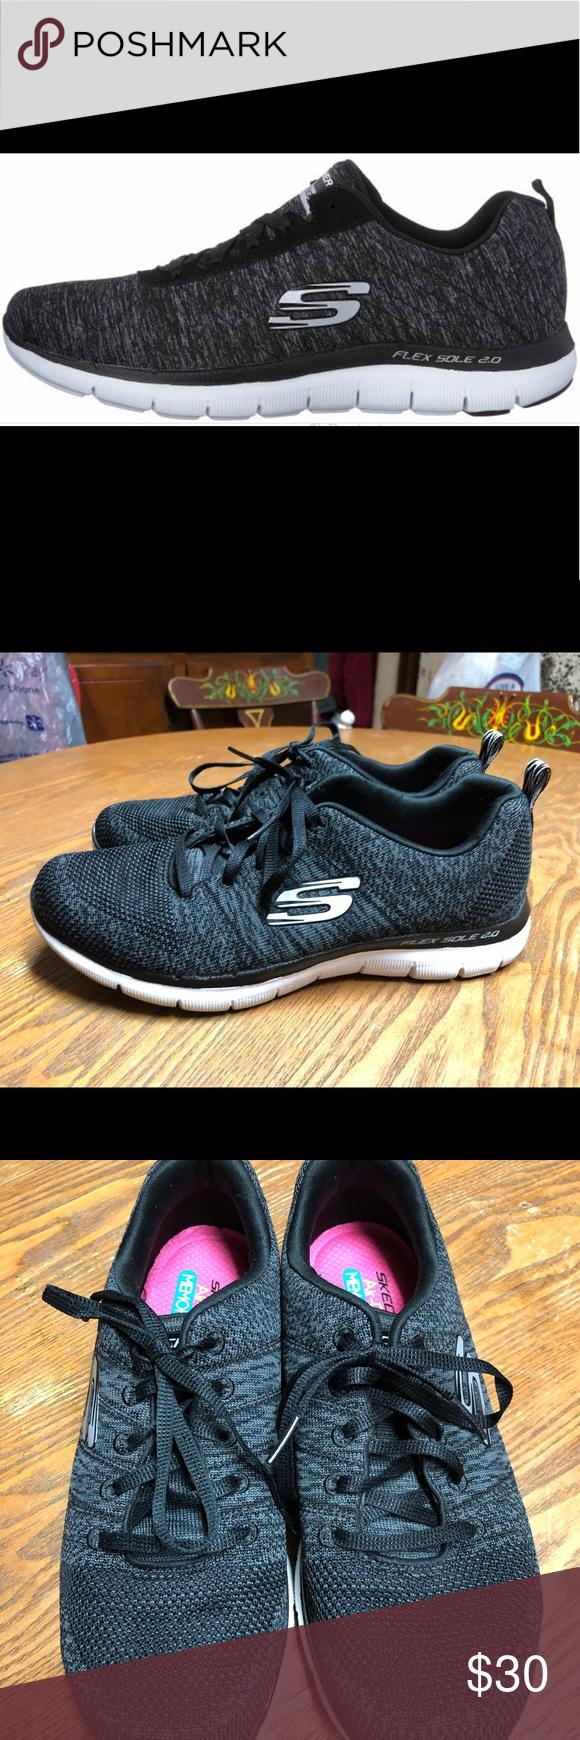 Compra > zapatos skechers flex sole zero OFF 67